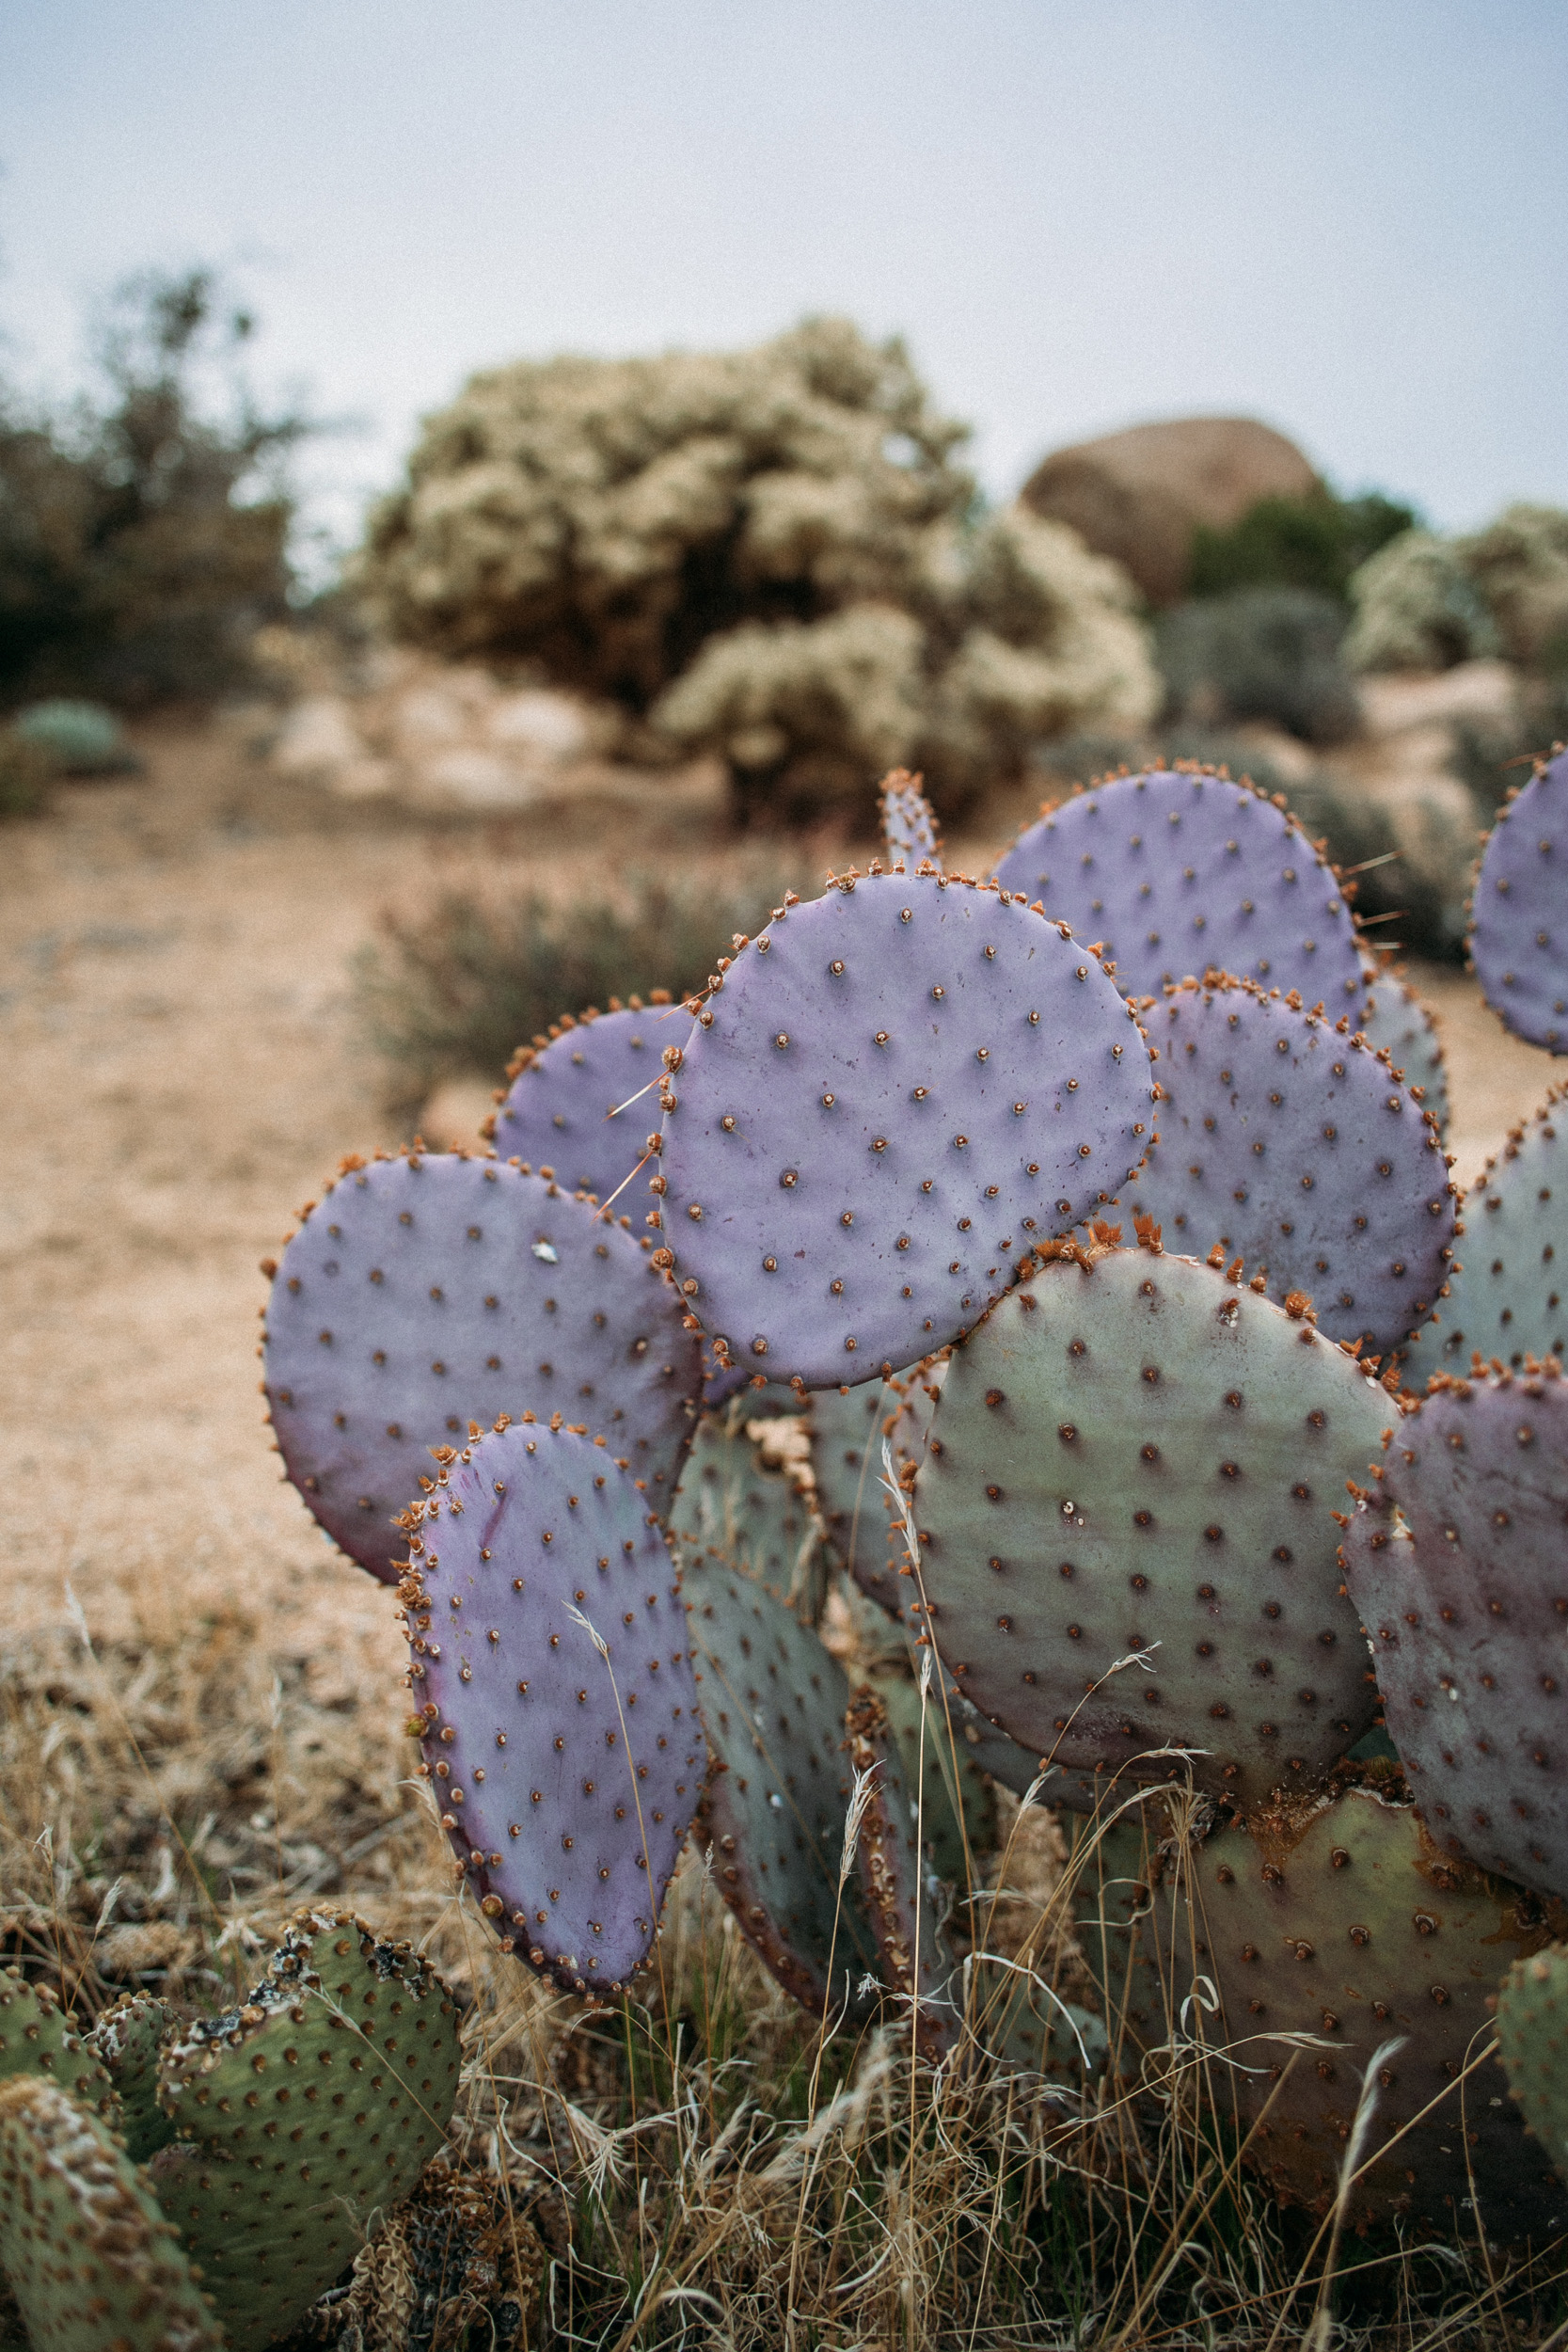 Joshua Tree Cactus Photography